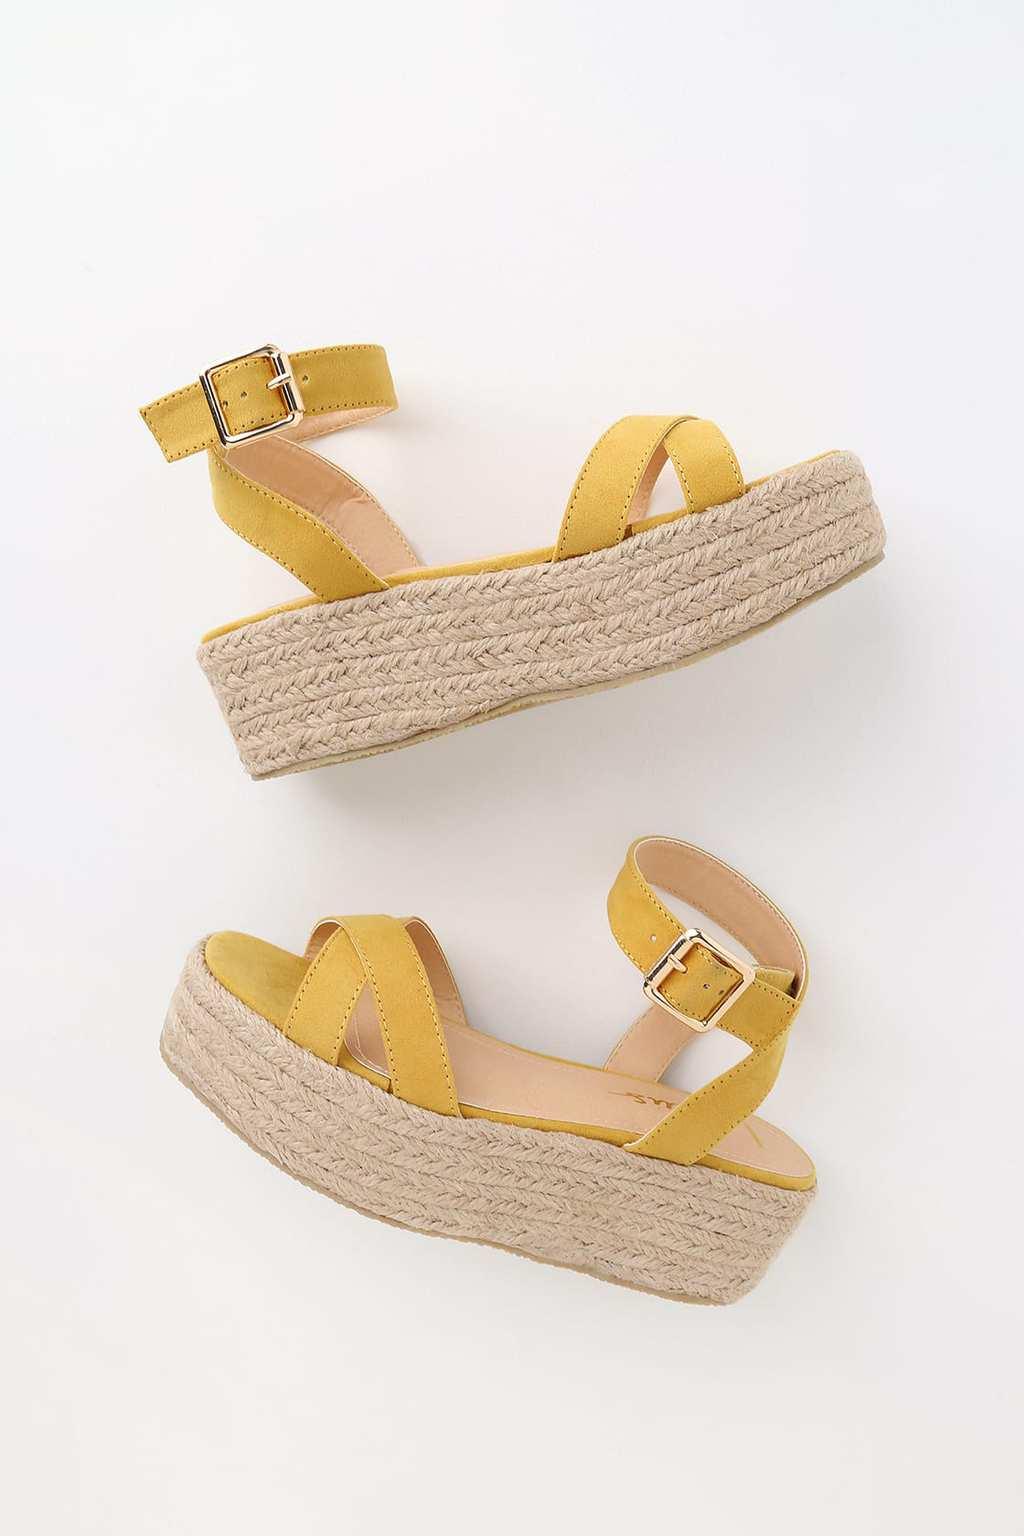 Yellow platform sandals with raffia